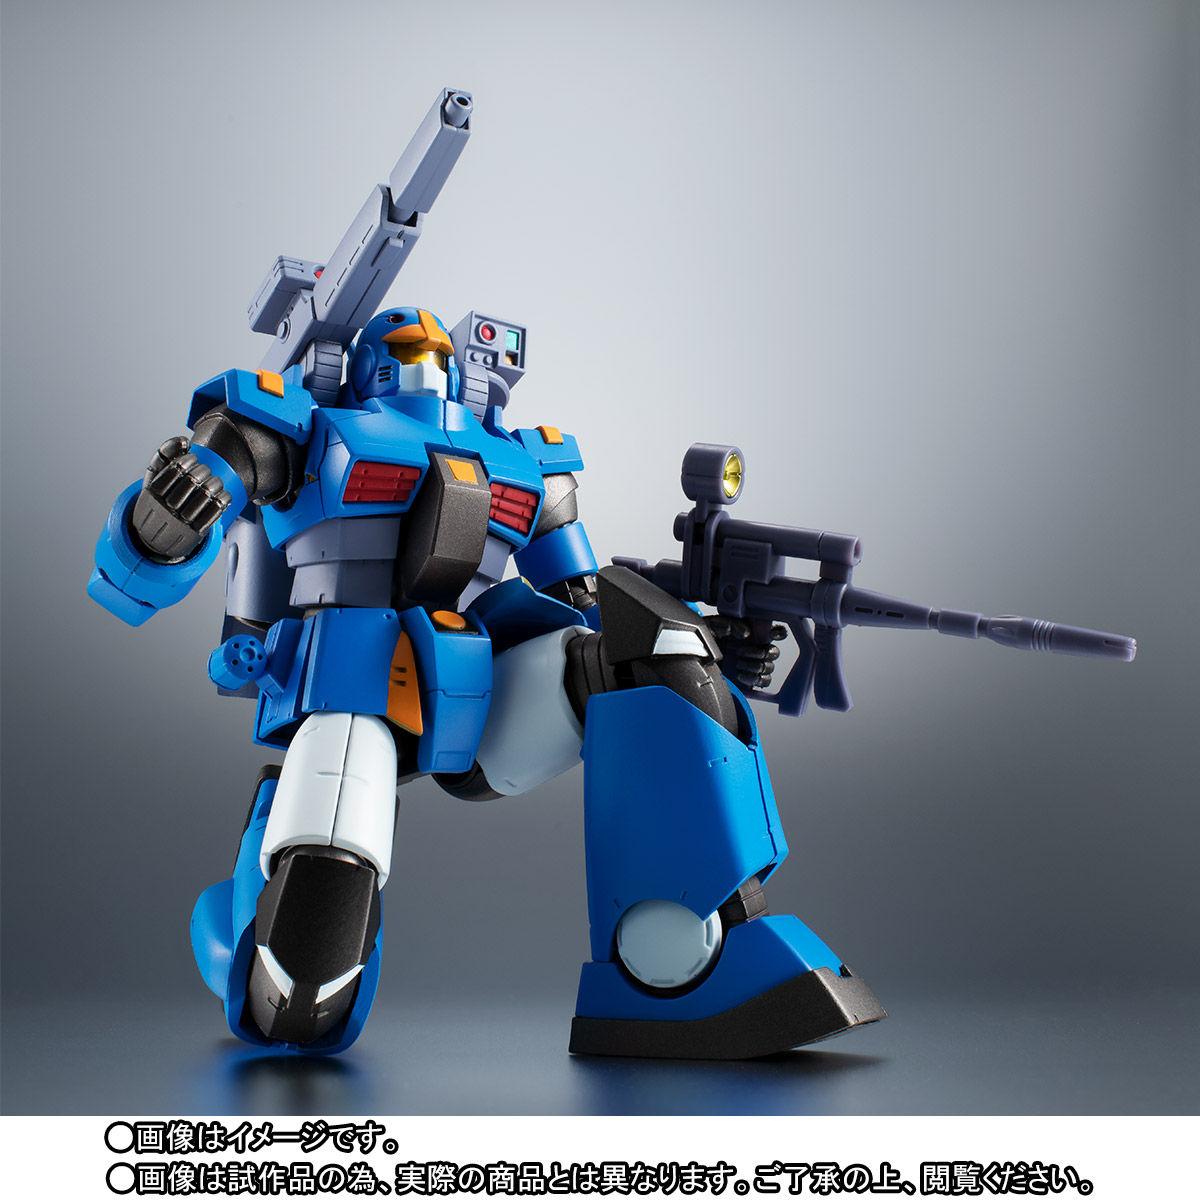 ROBOT魂〈SIDE MS〉『RX-77-3 ガンキャノン重装型 ver. A.N.I.M.E.』ガンダムMSV 可動フィギュア-006